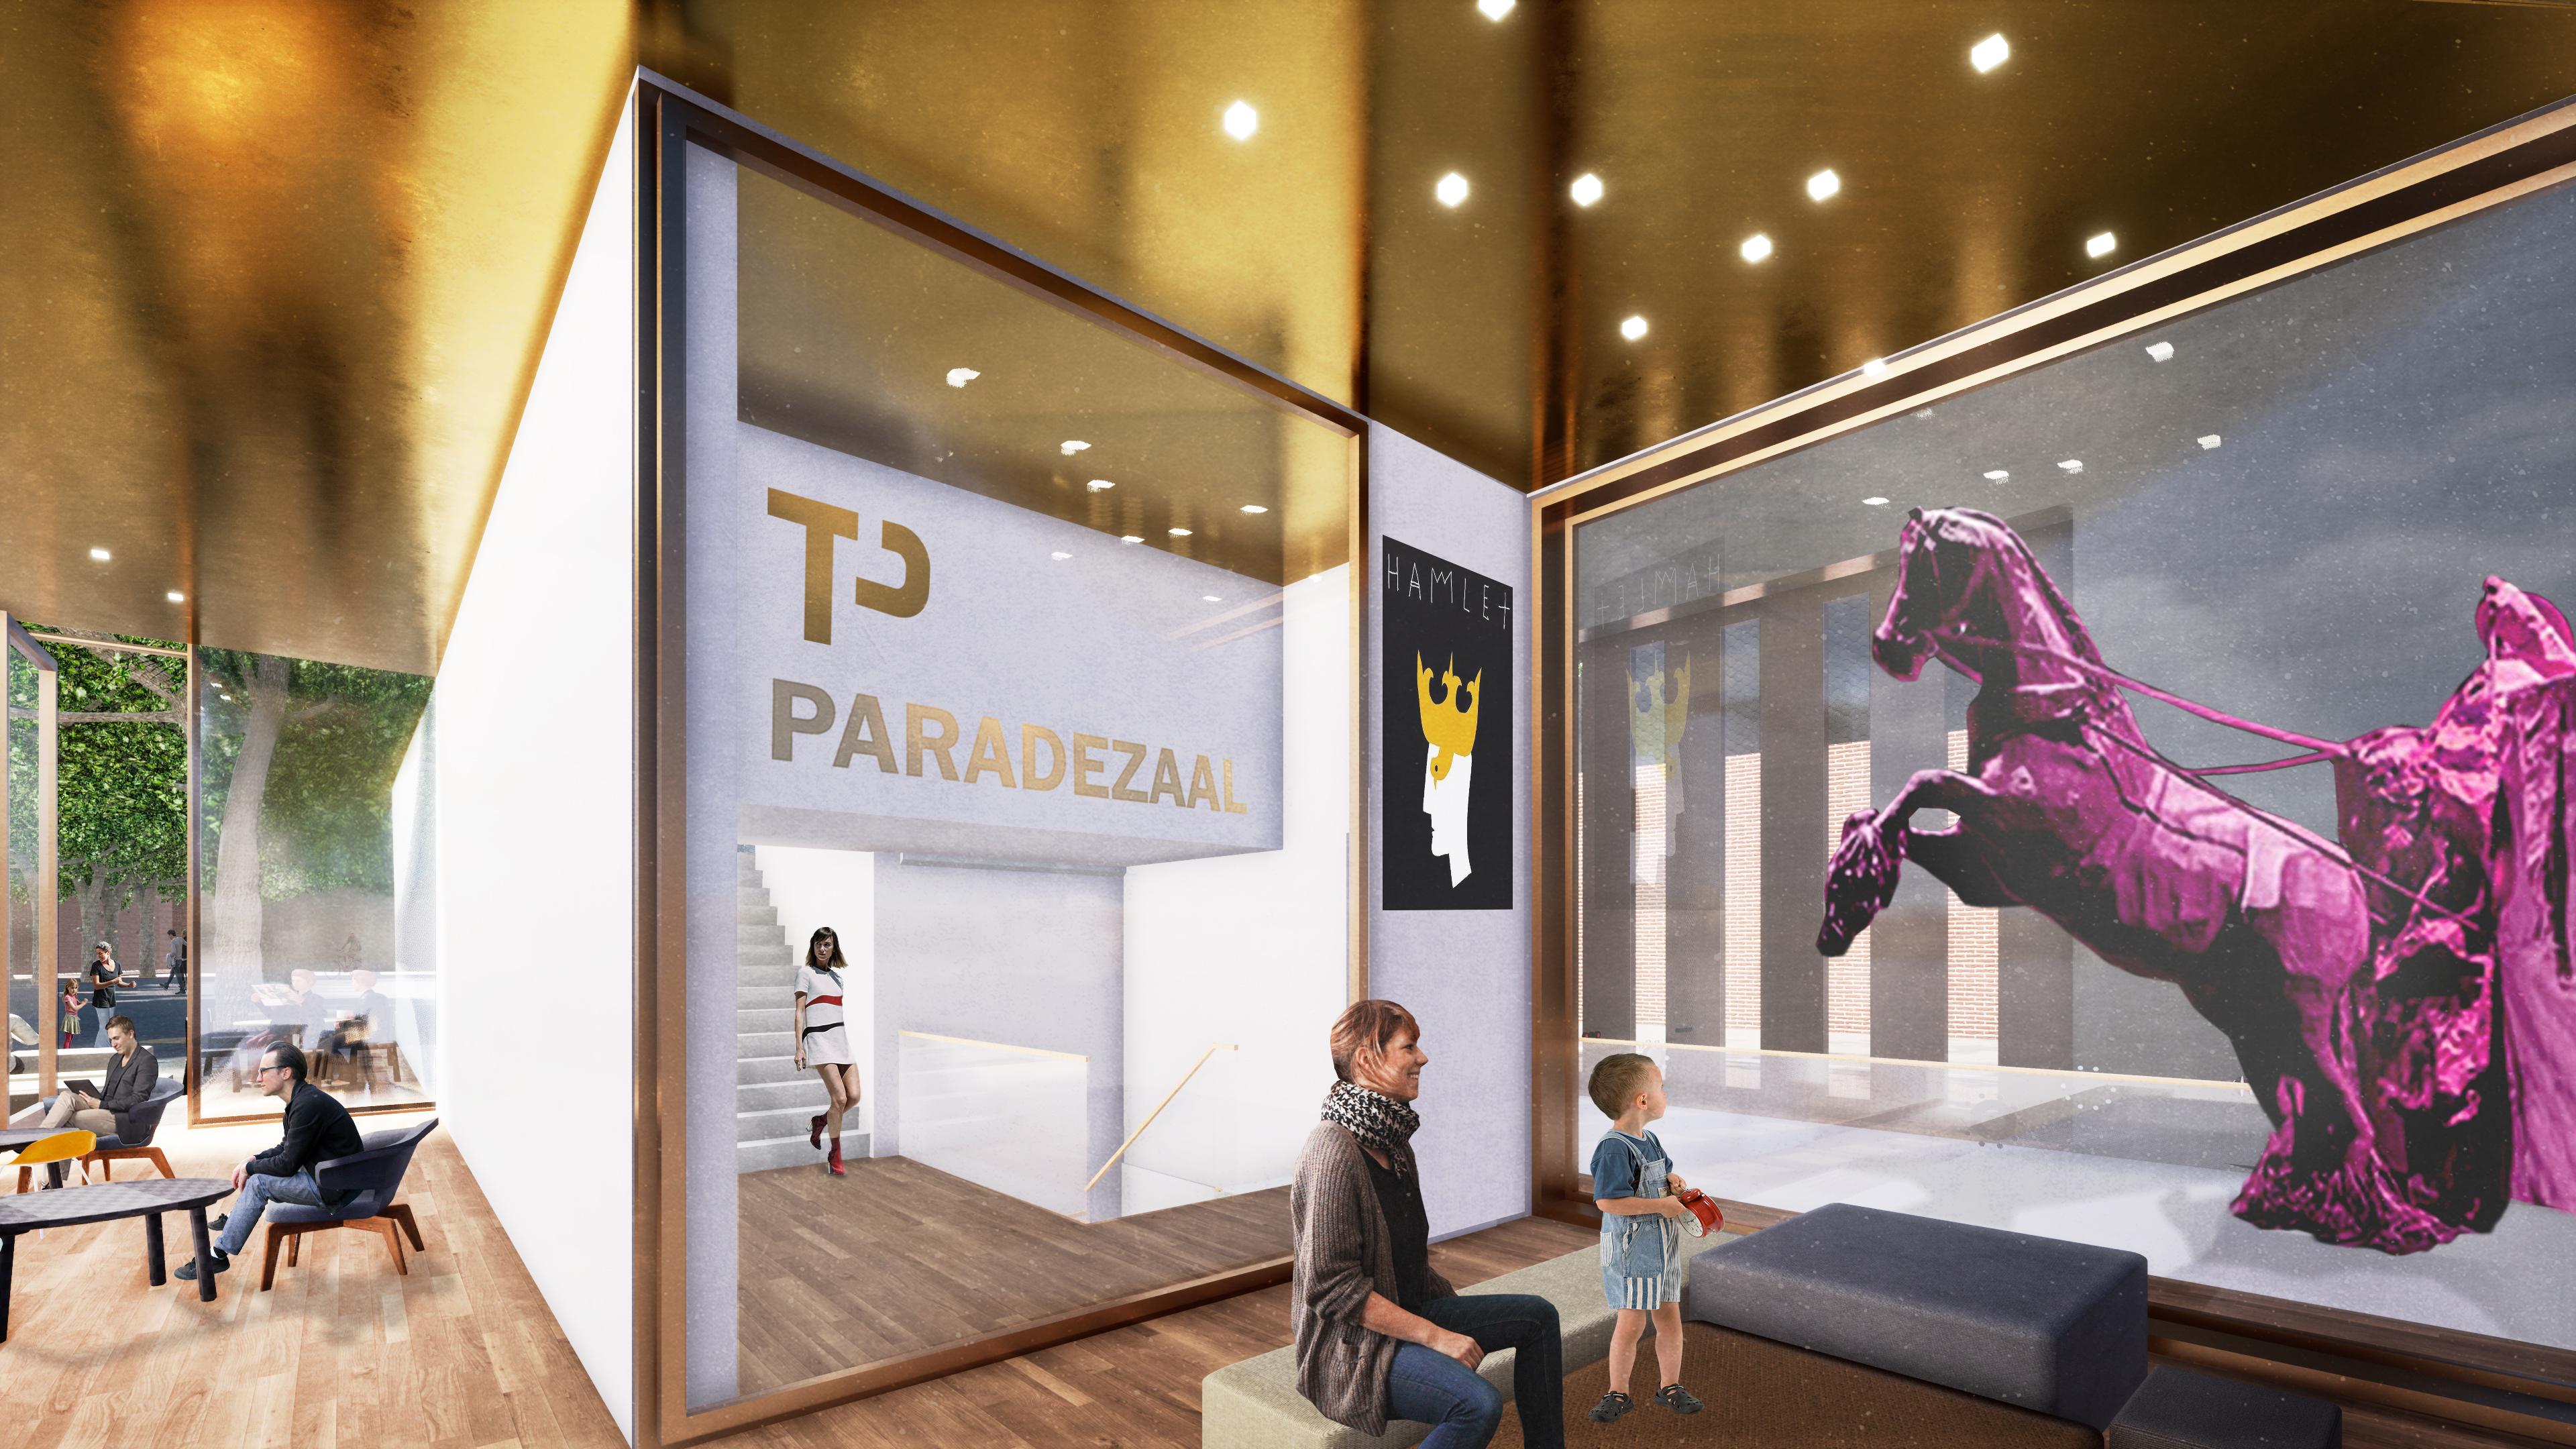 <p>Interieur theatercafe lounge. Theater aan de Parade door NOAHH   Network Oriented Architecture</p>